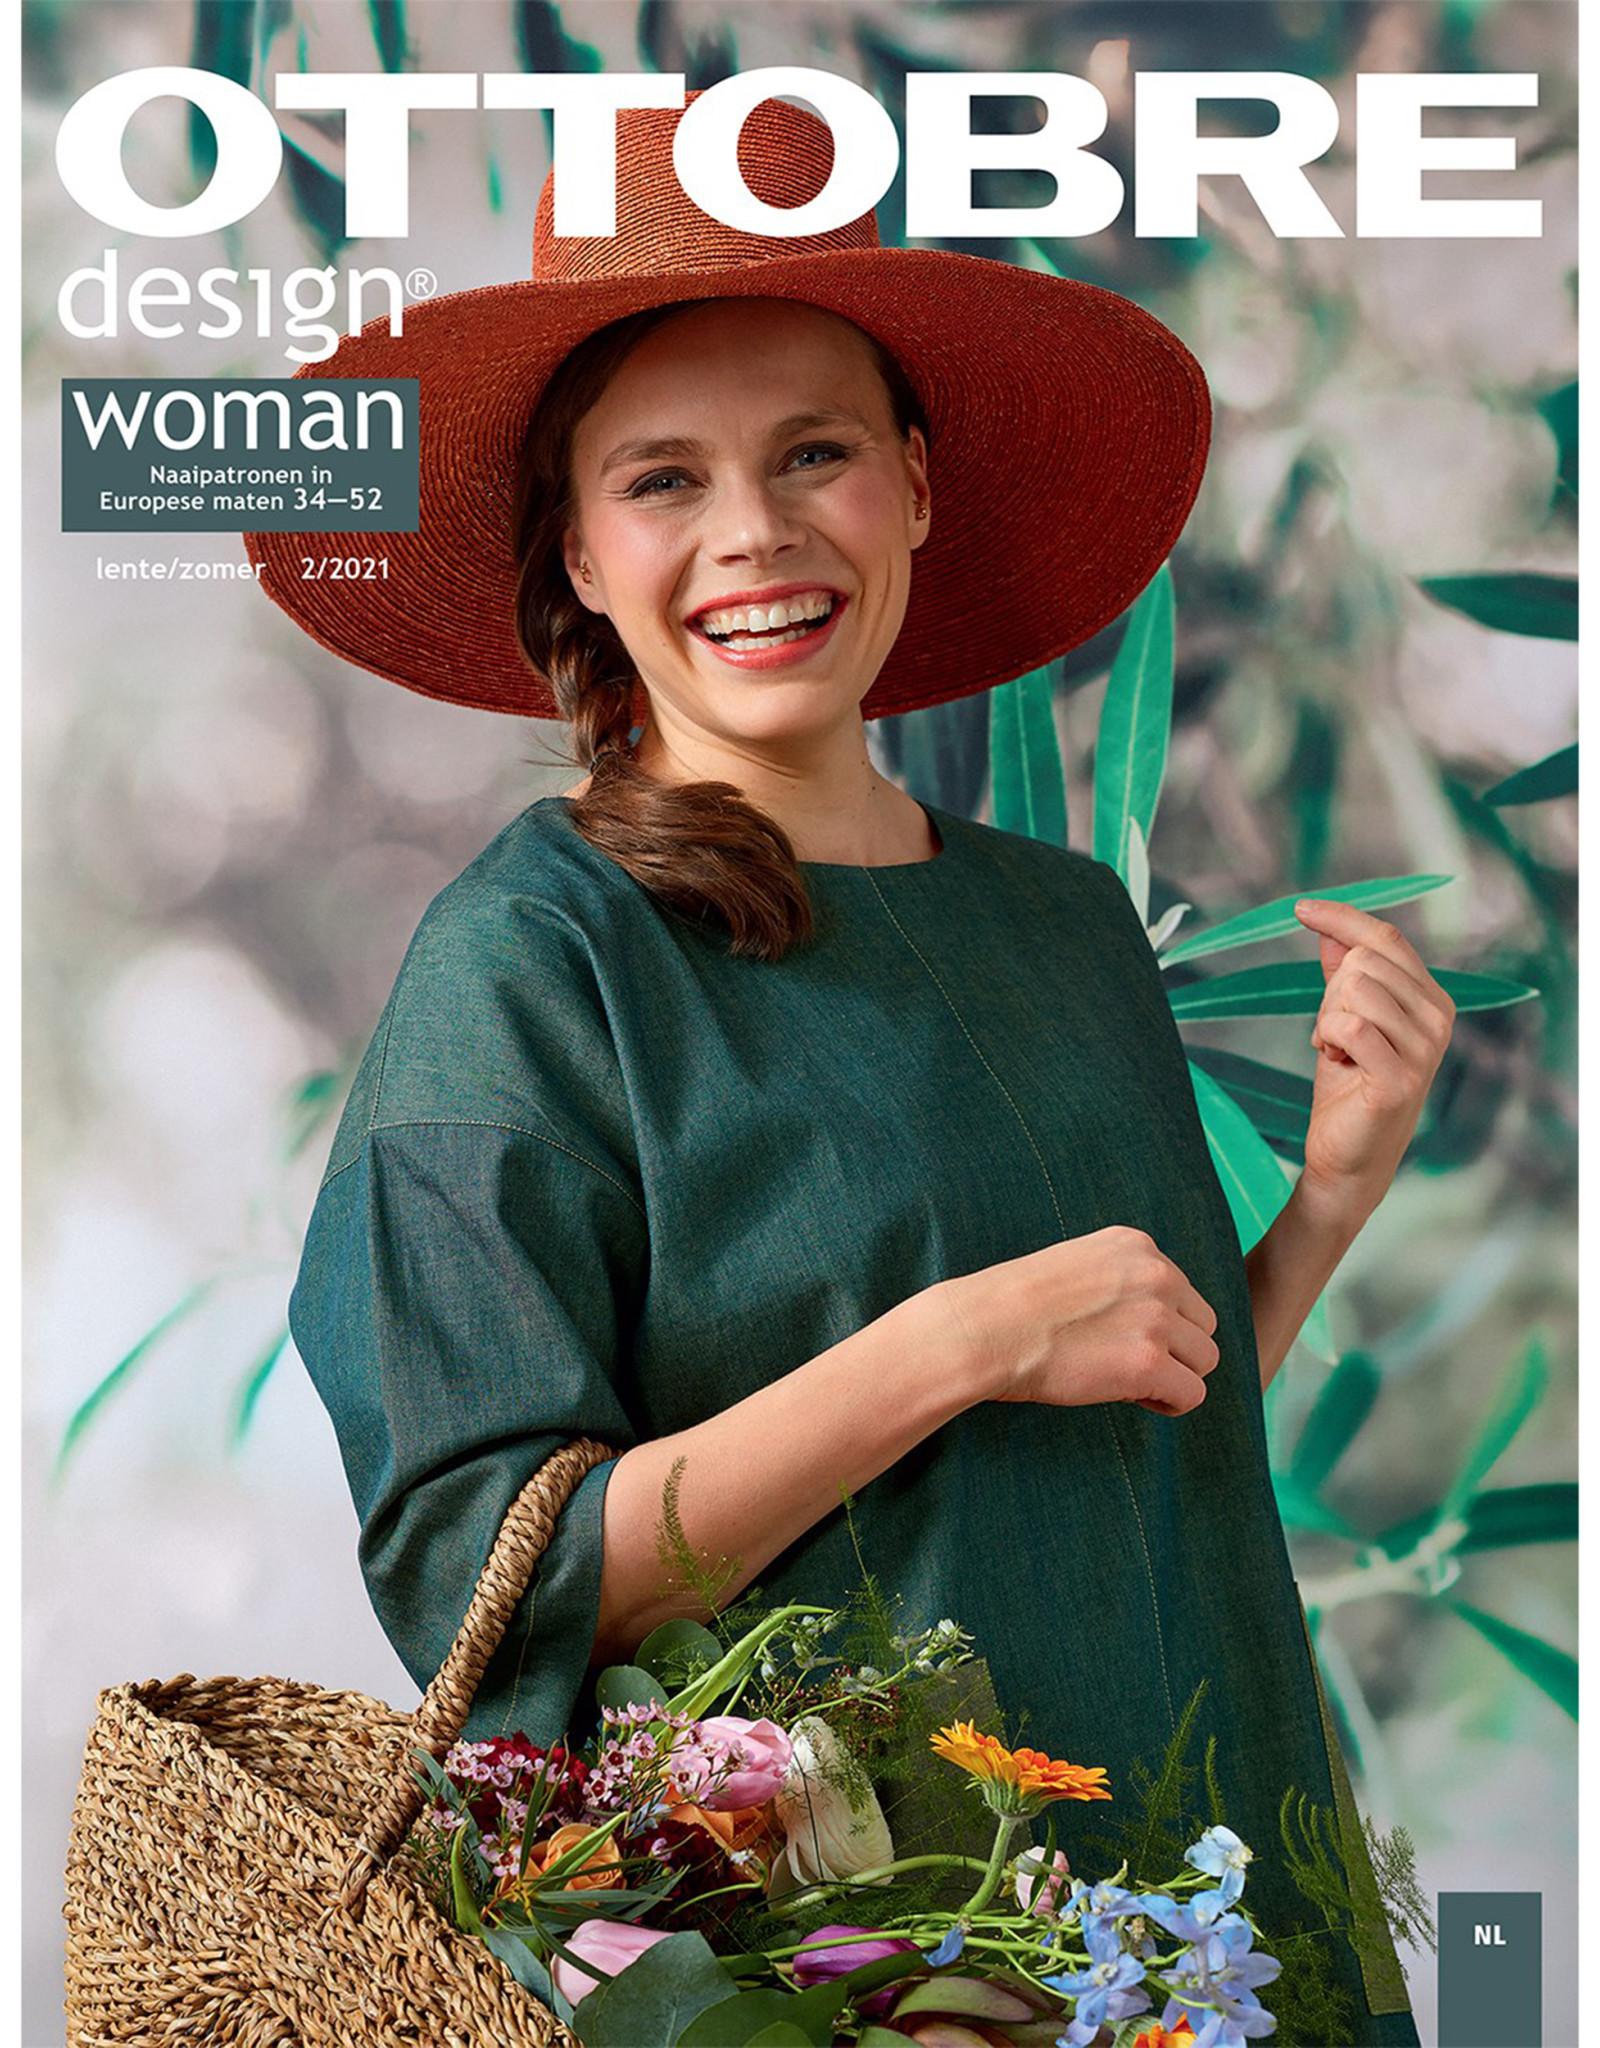 Ottobre Ottobre magazine vrouwen lente 2/2021